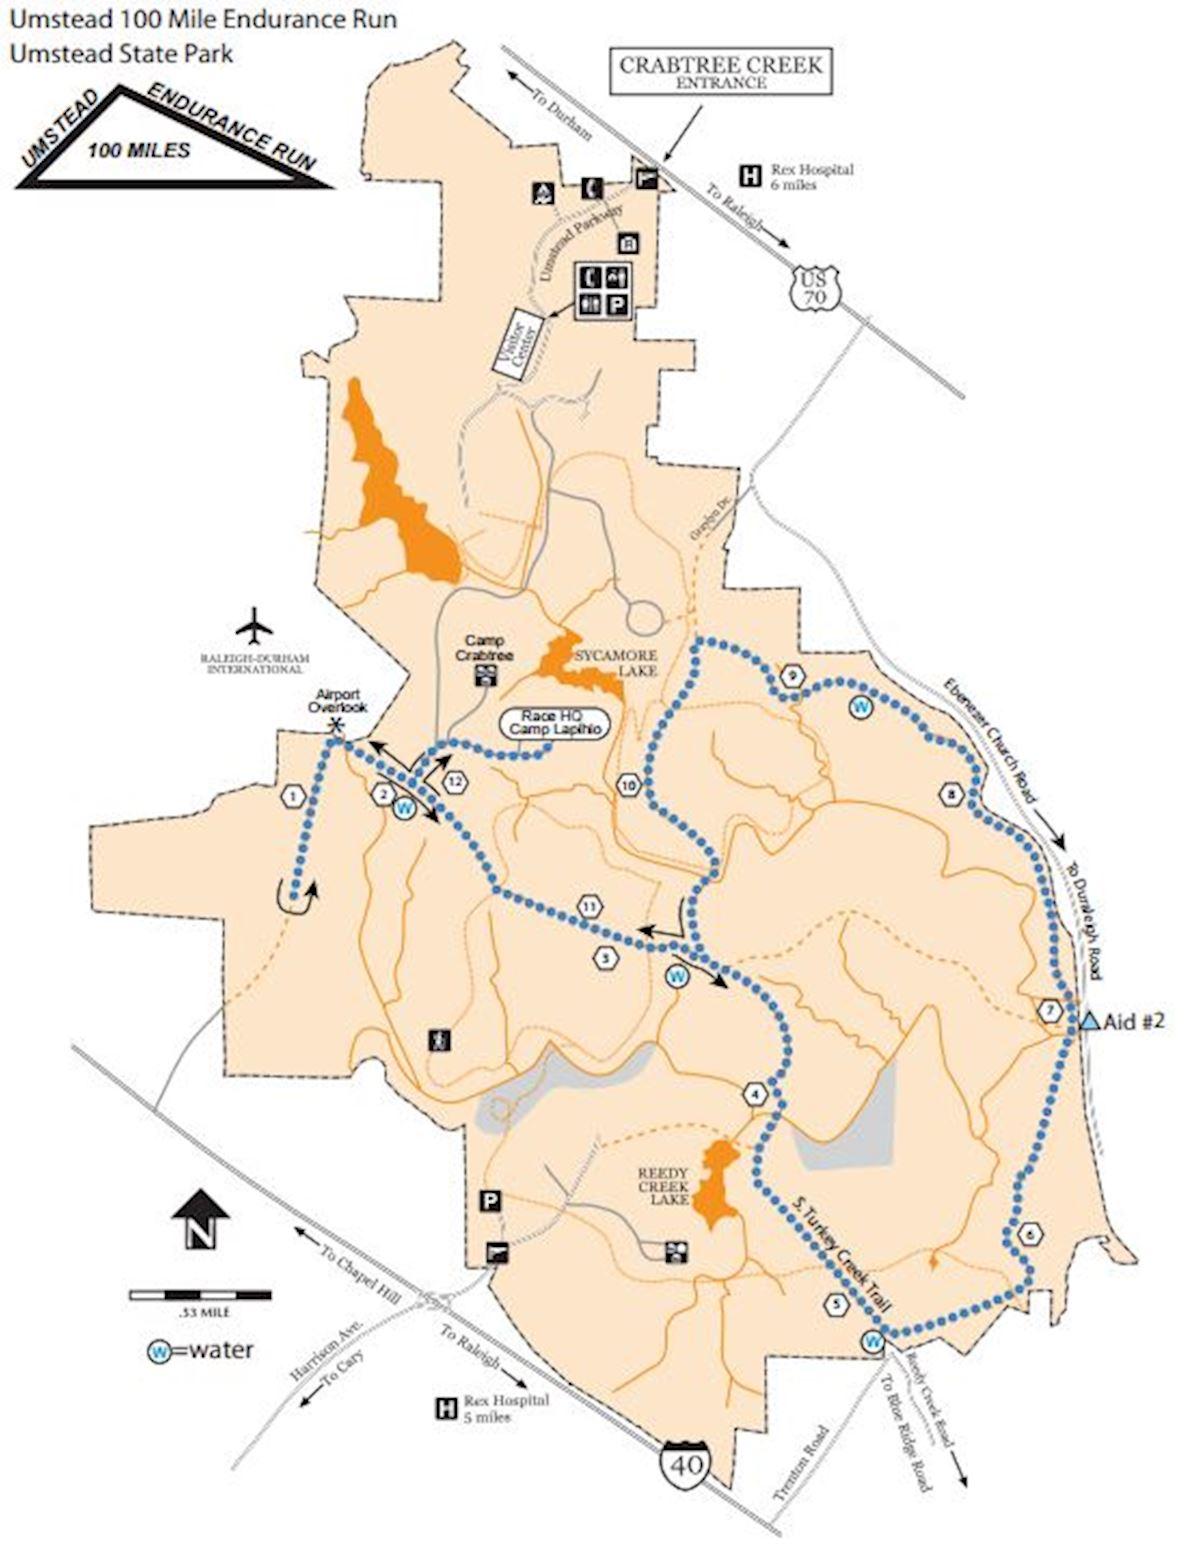 Umstead 100 Mile Endurance Run Routenkarte